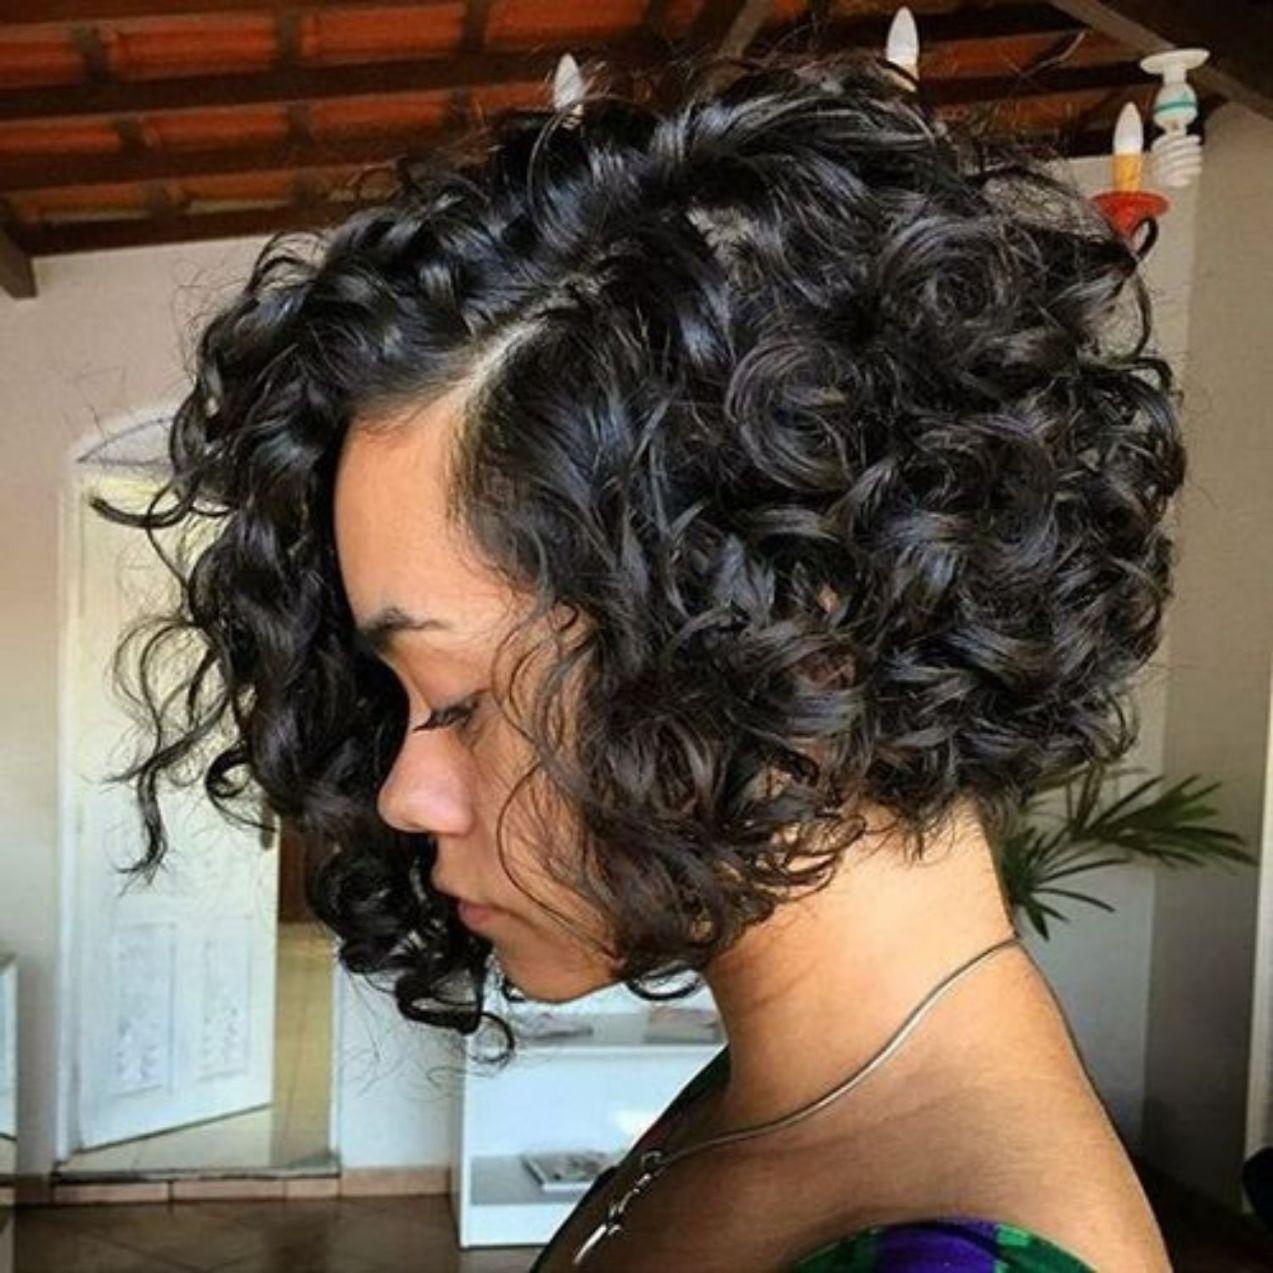 Short Bob Hairstyles Black Women Wavy Nice Curly Bob Hairstyles For Black Women With Images Bob Hairstyles Short Curly Bob Hairstyles Bob Haircuts For Women